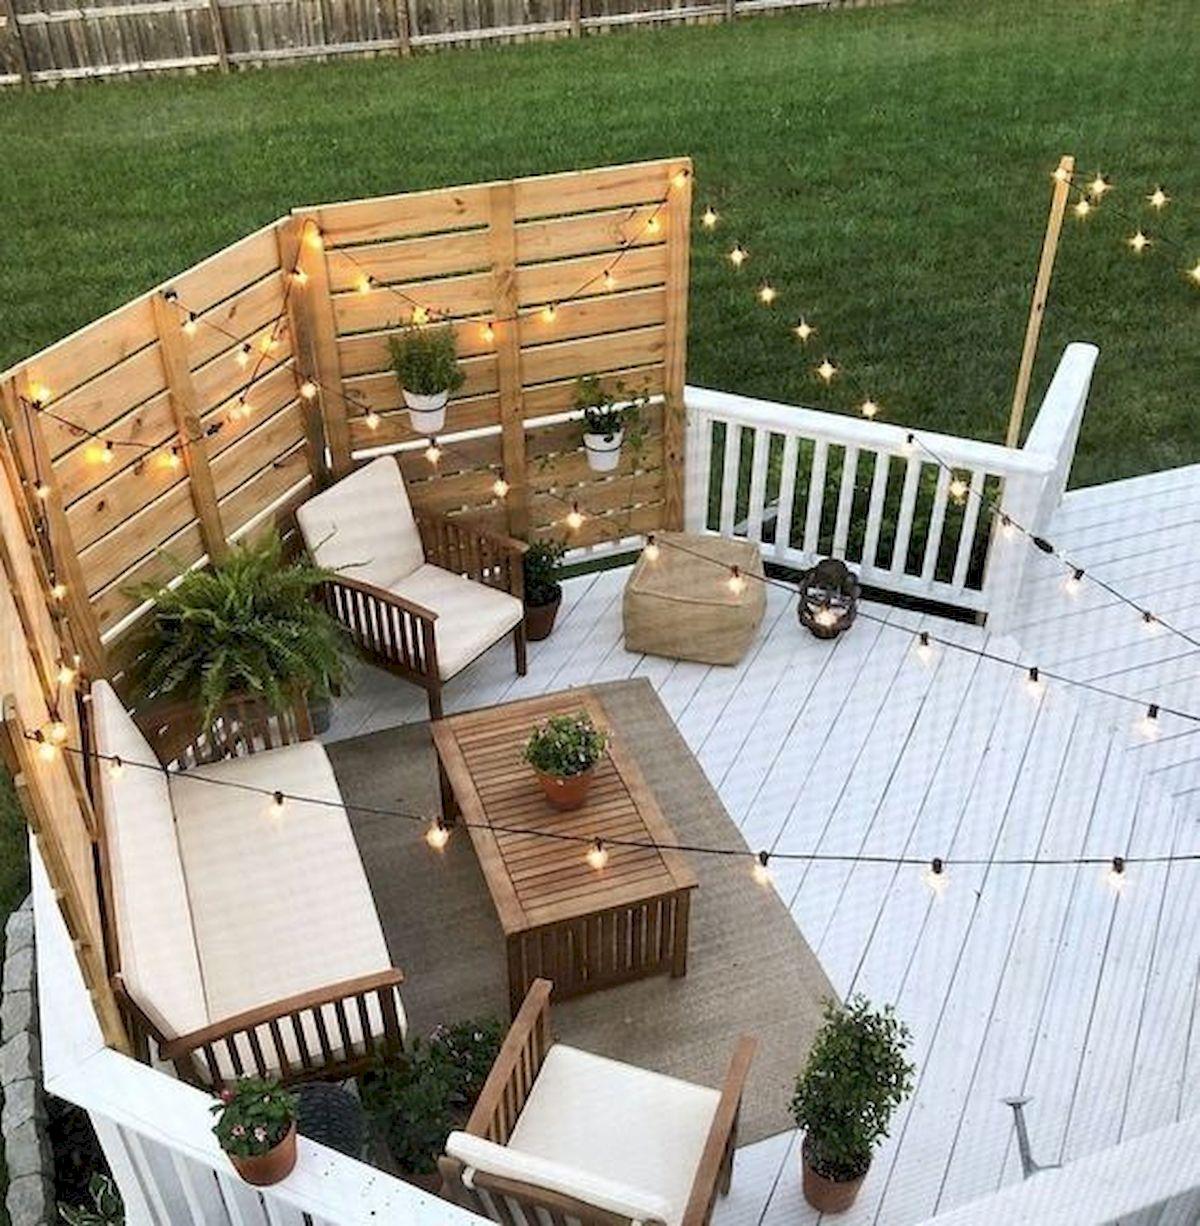 50 Fantastic Backyard Patio and Decking Design Ideas (22)